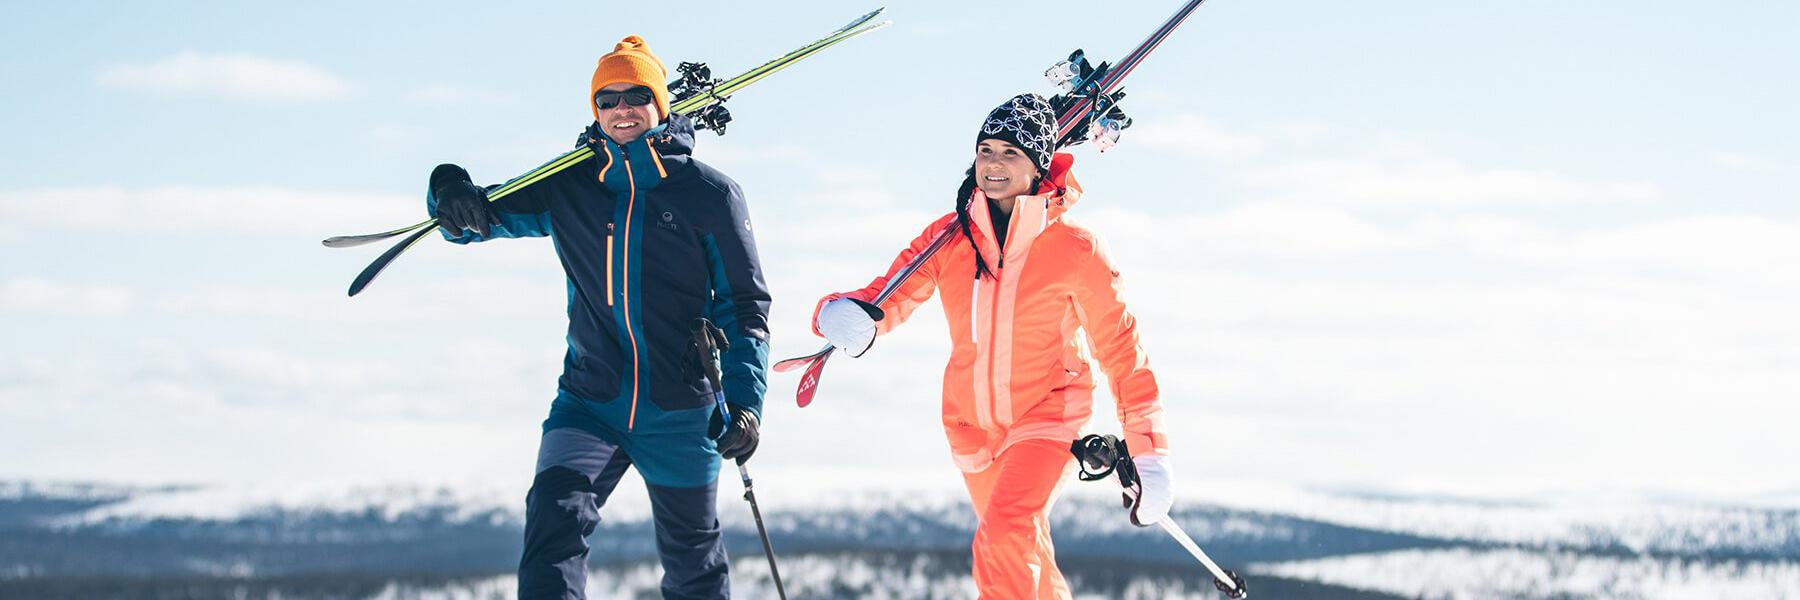 Halti skiwear